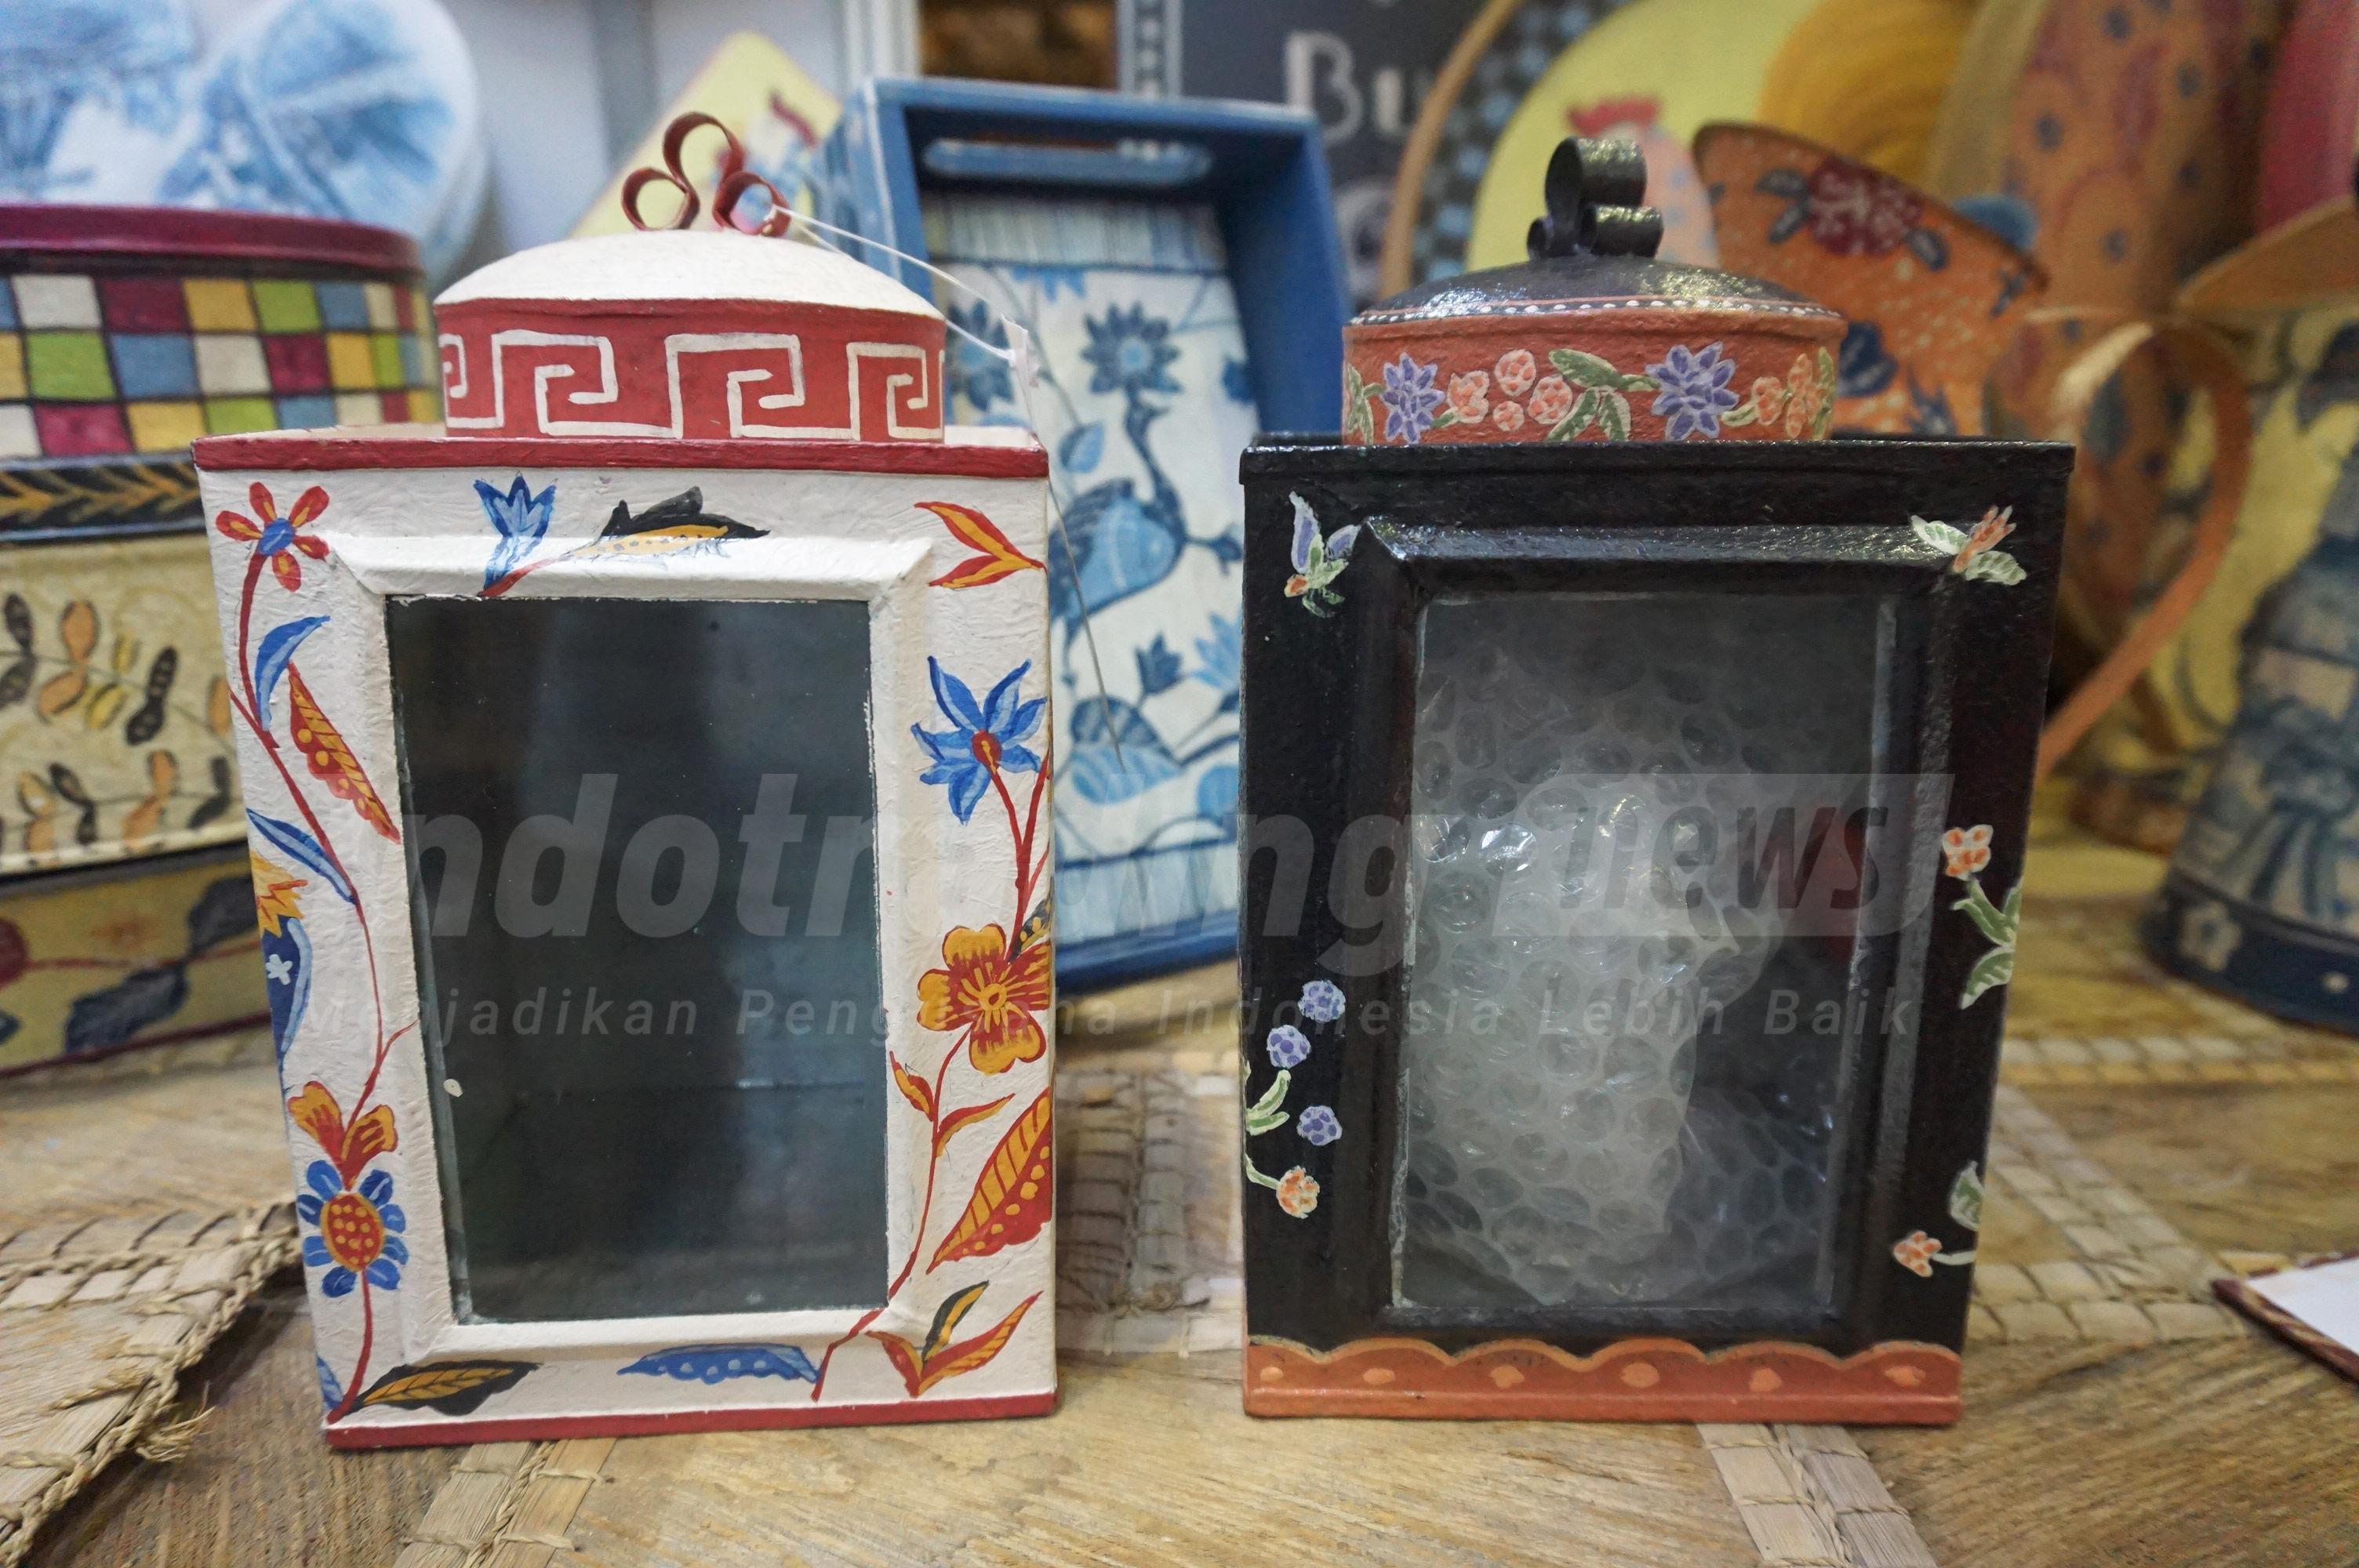 Foto: produk Wastraloka yang terbuat dari kaleng bekas/ Dok: indotrading.com